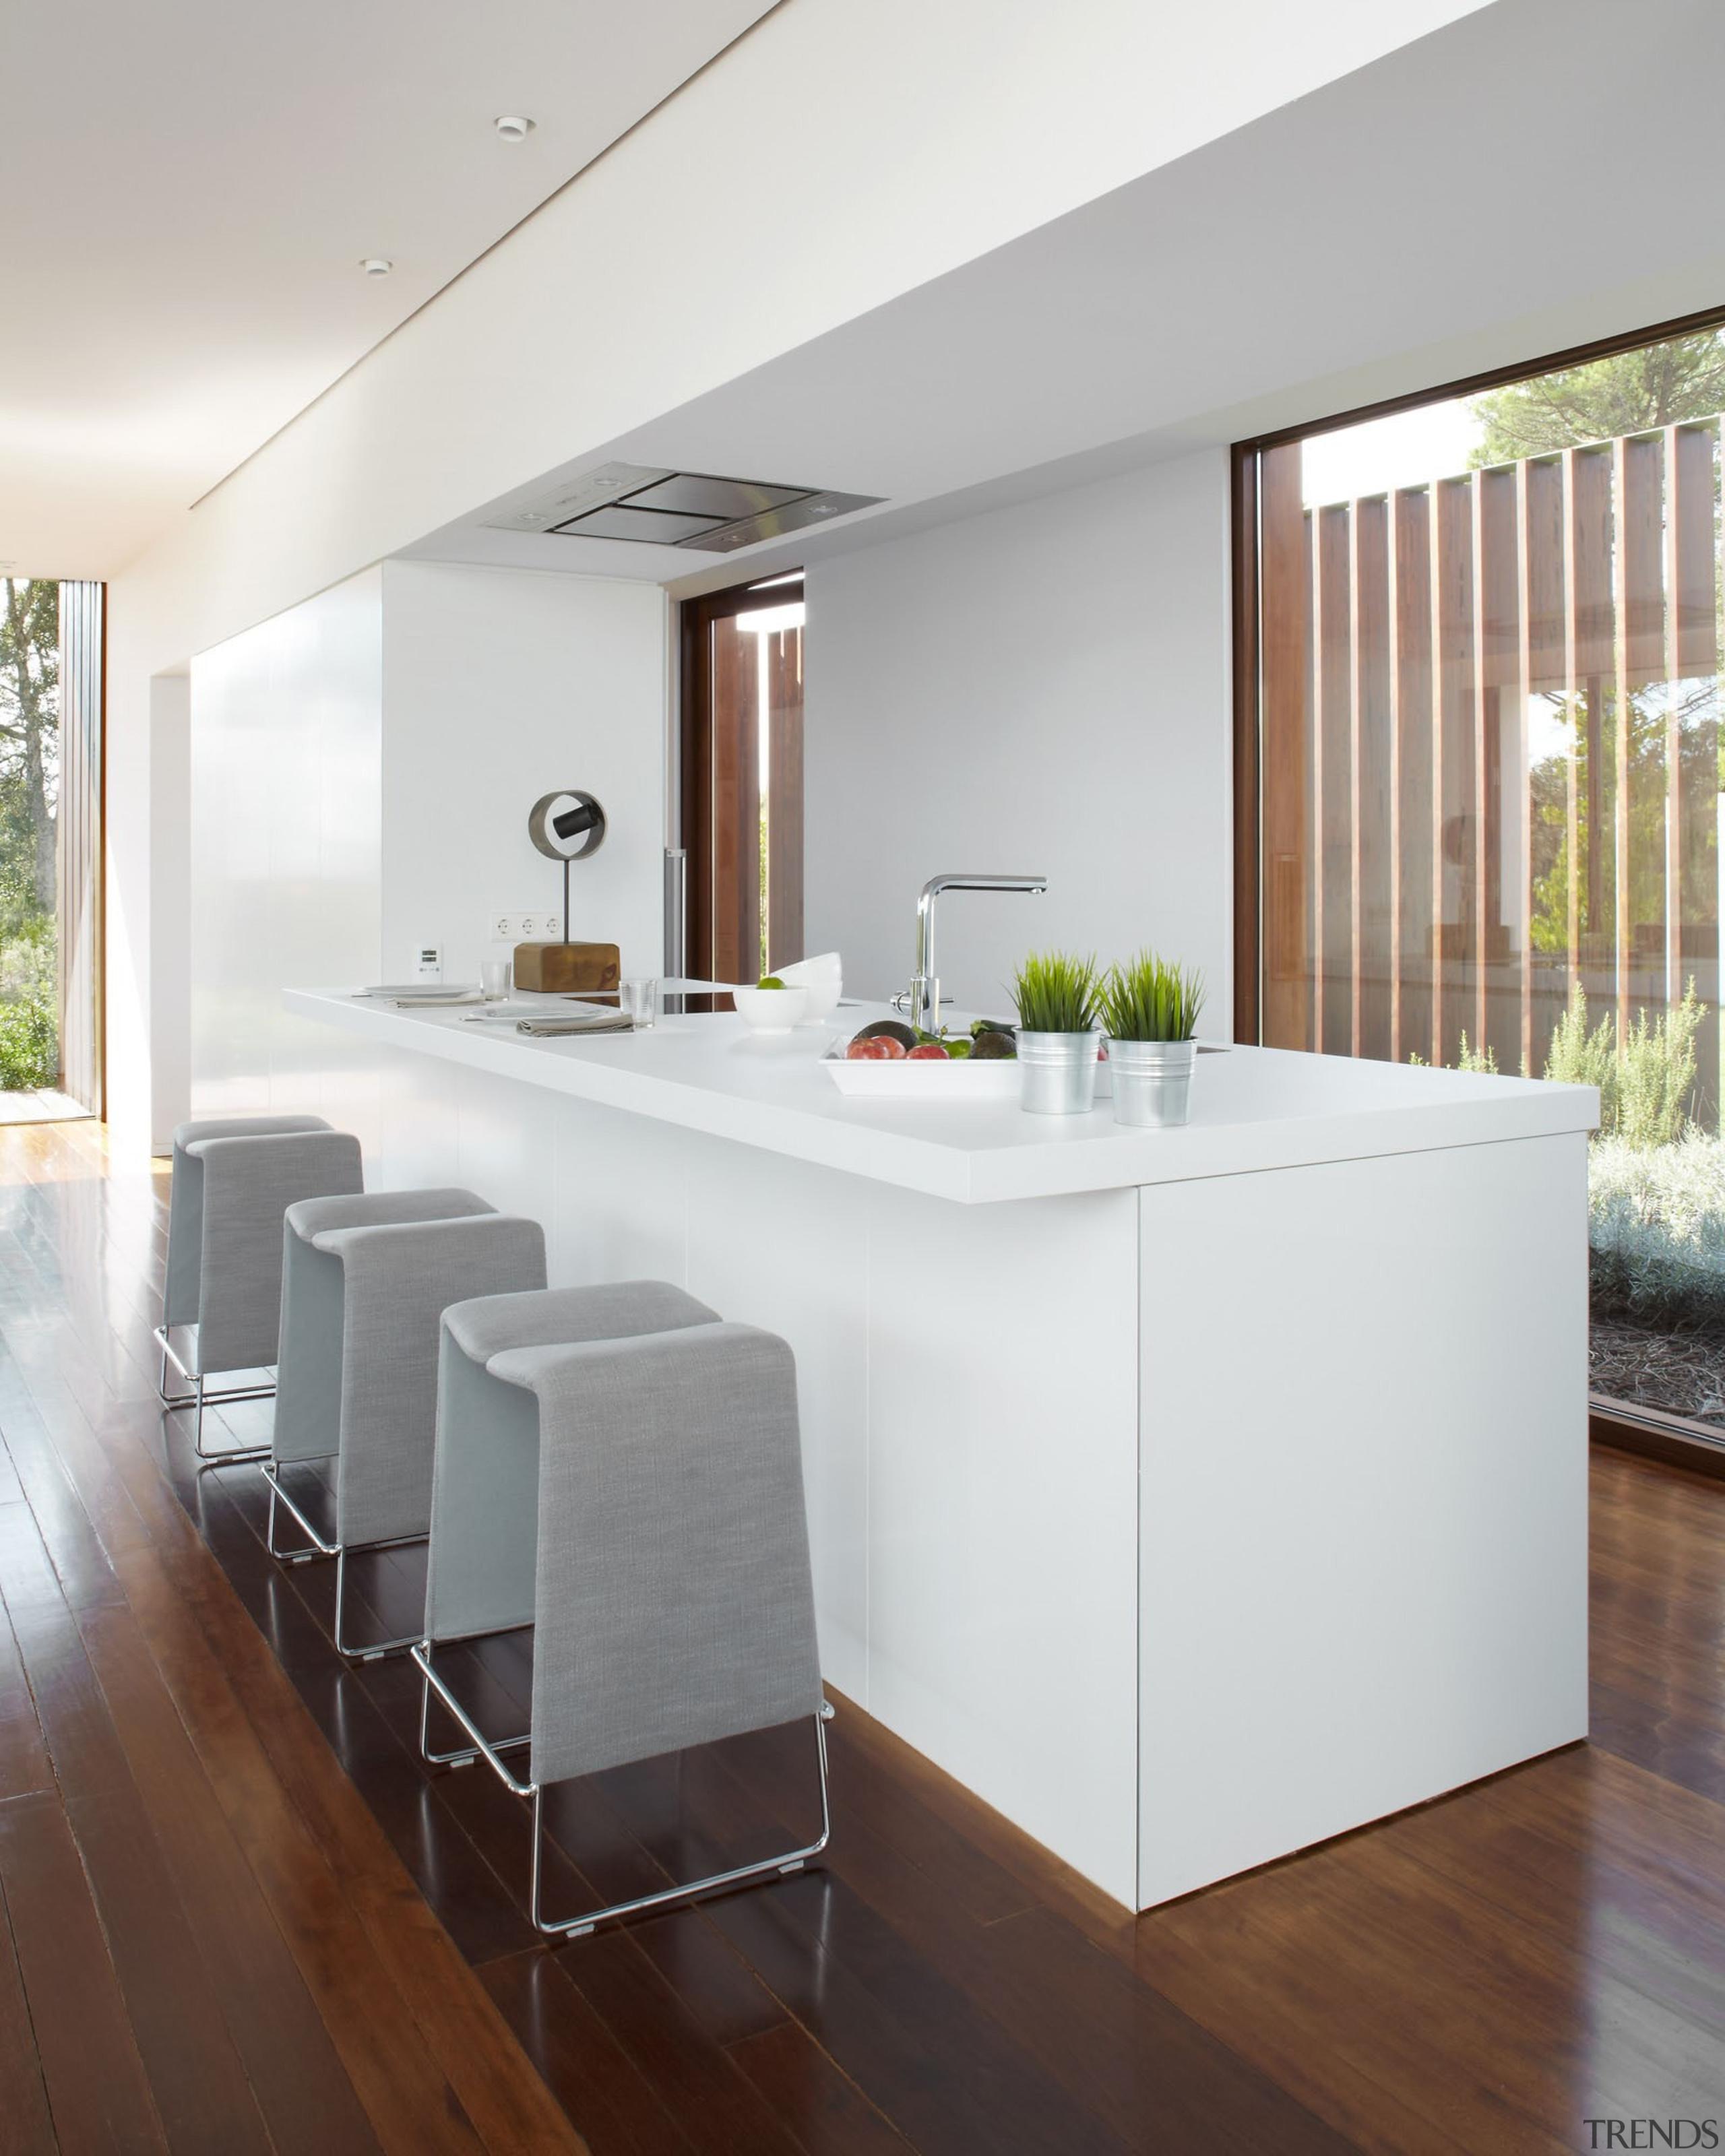 Silestone Blanco Zeus - encimera cocina 5 - floor, furniture, house, interior design, kitchen, living room, table, gray, white